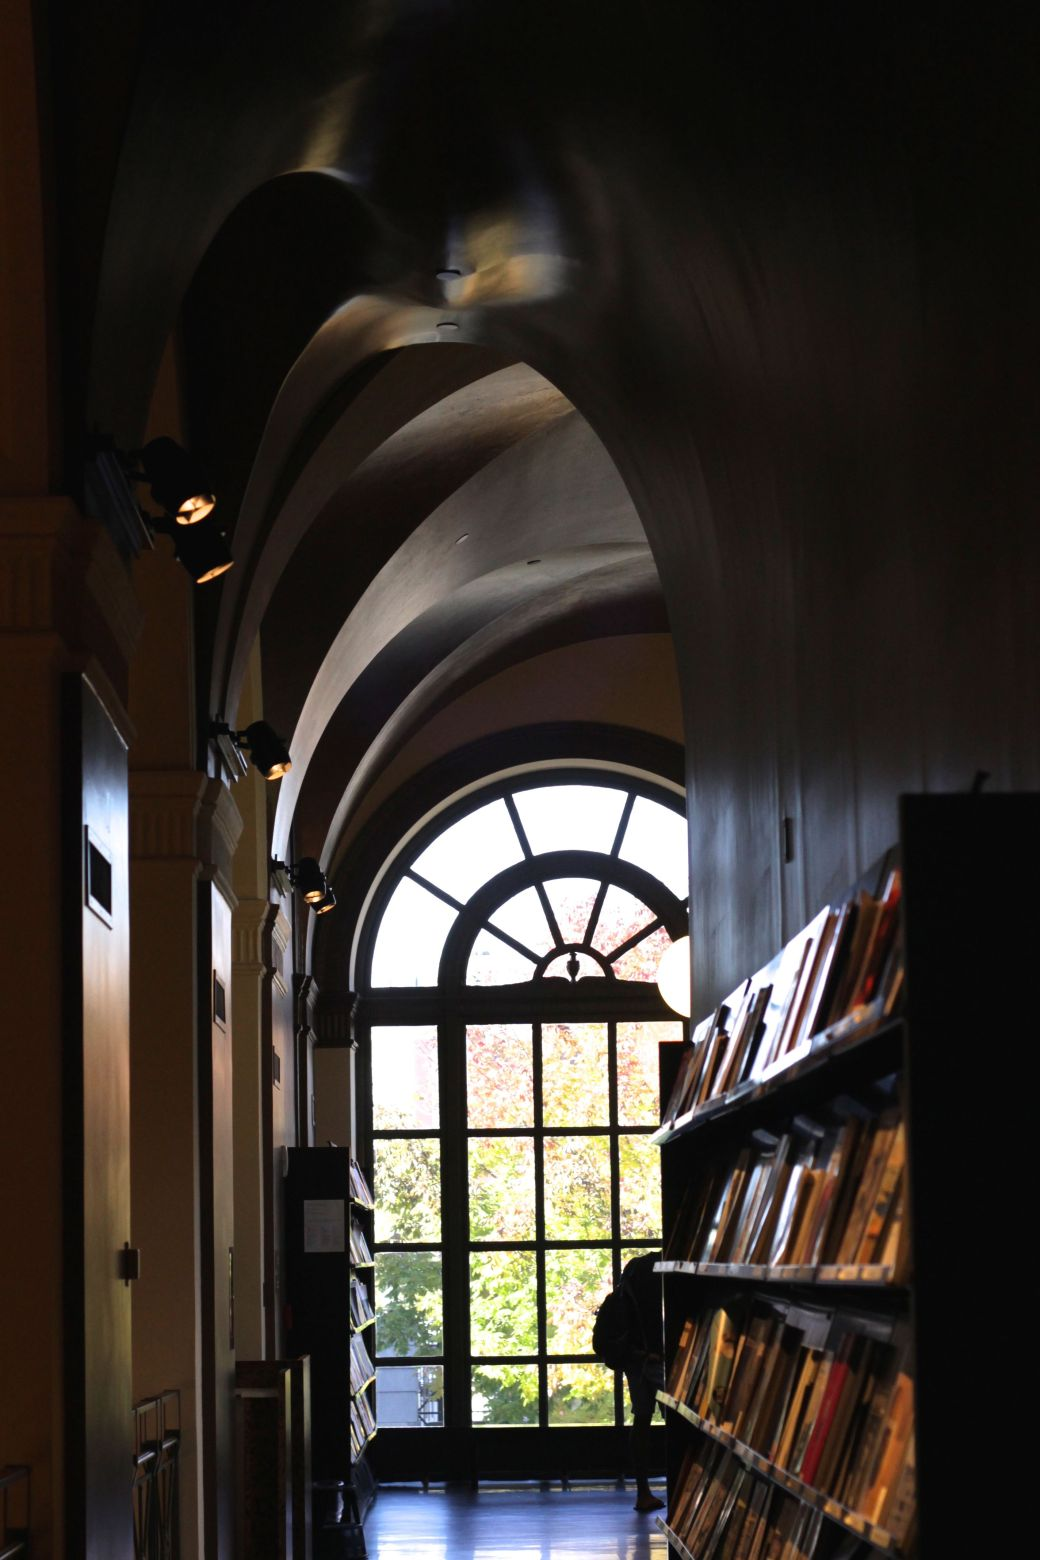 rhode island providence rhode island school of design library arches